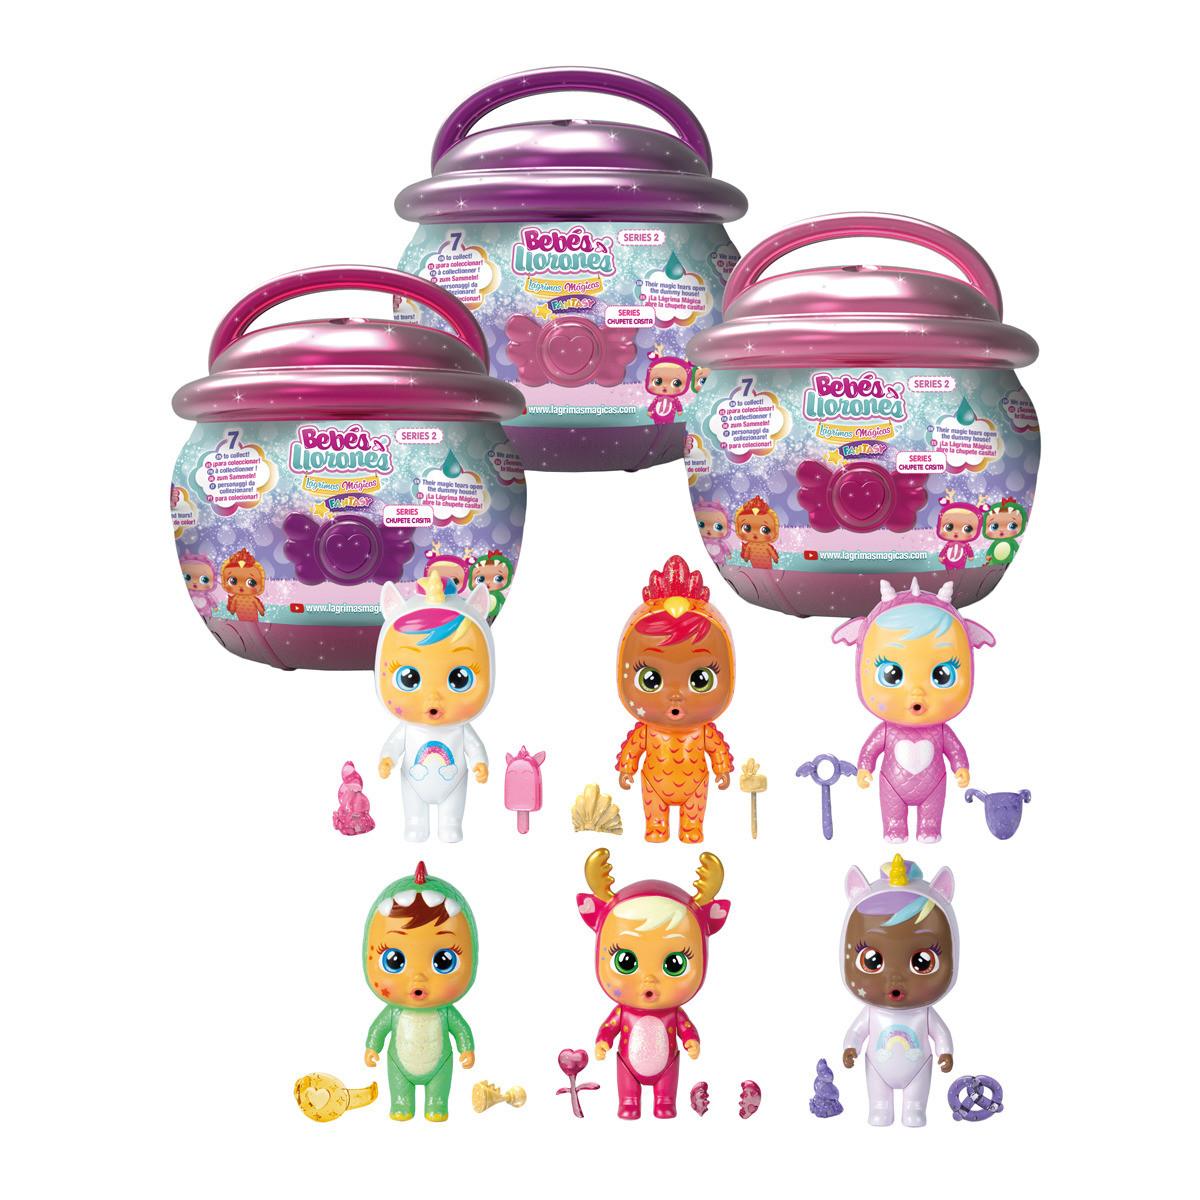 IMC Toys - Boneco Bebé Cry Babies IMC Toys (11 cm)